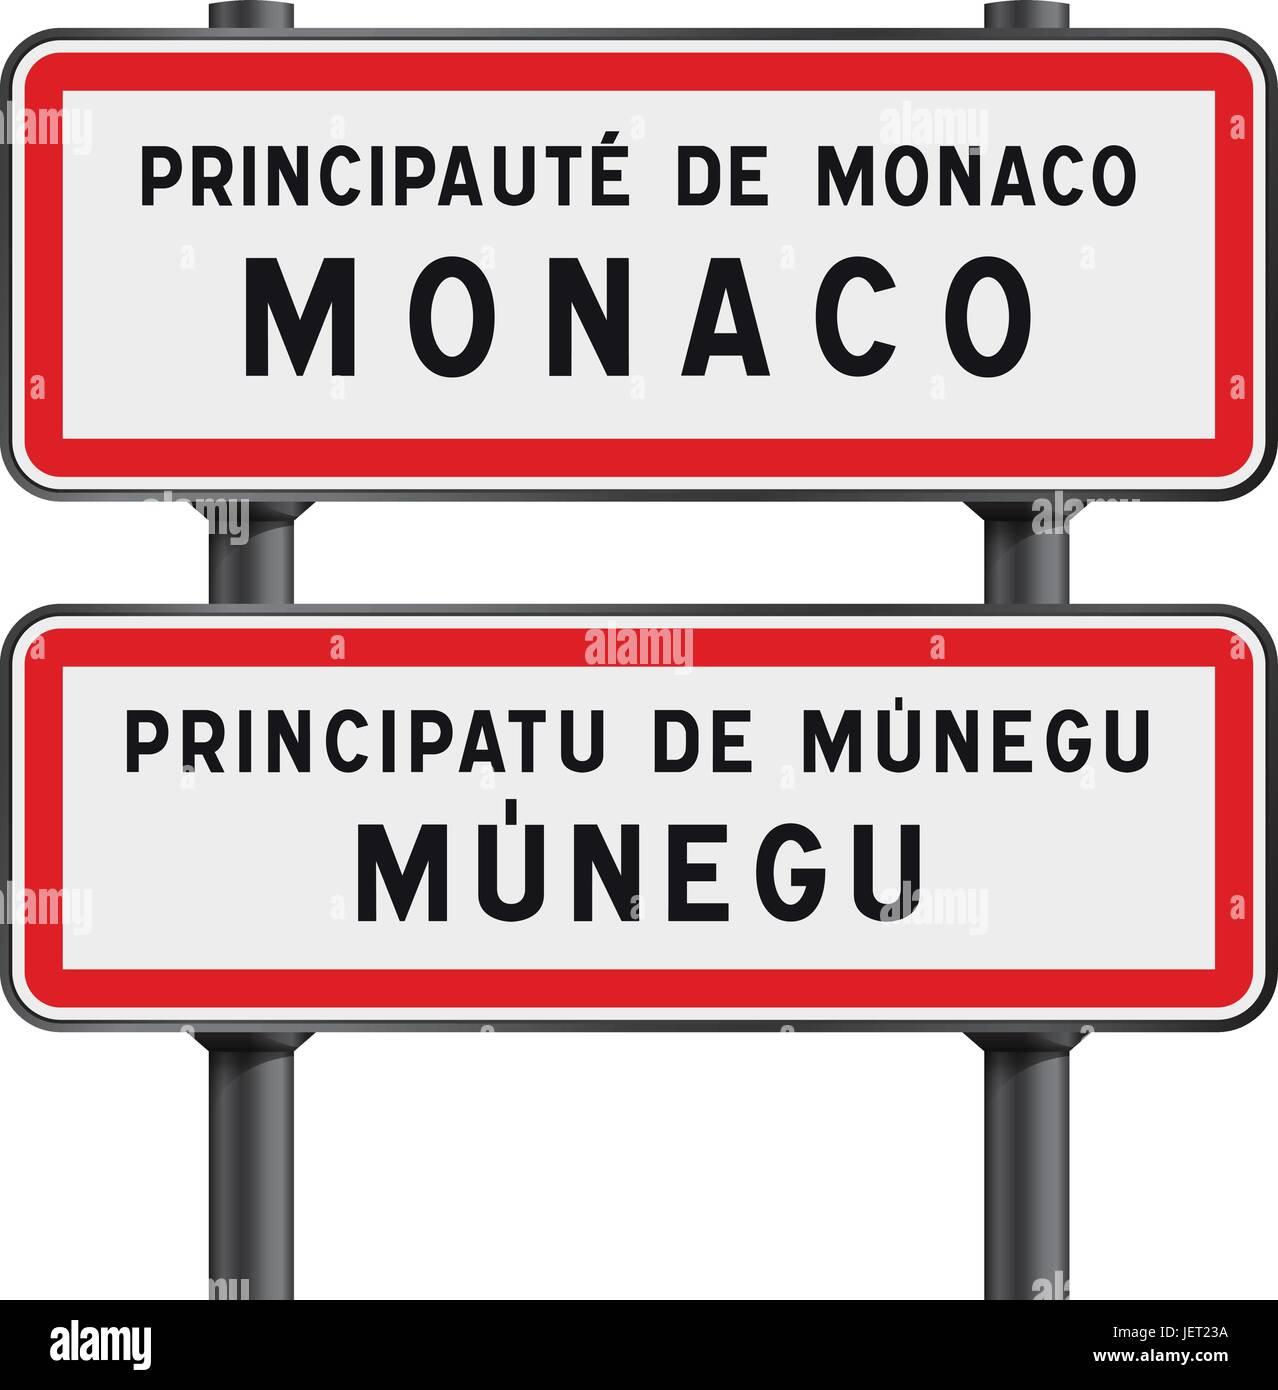 Vector illustration of Monaco road signs entrance with the Monegasque traduction Munegu - Stock Vector